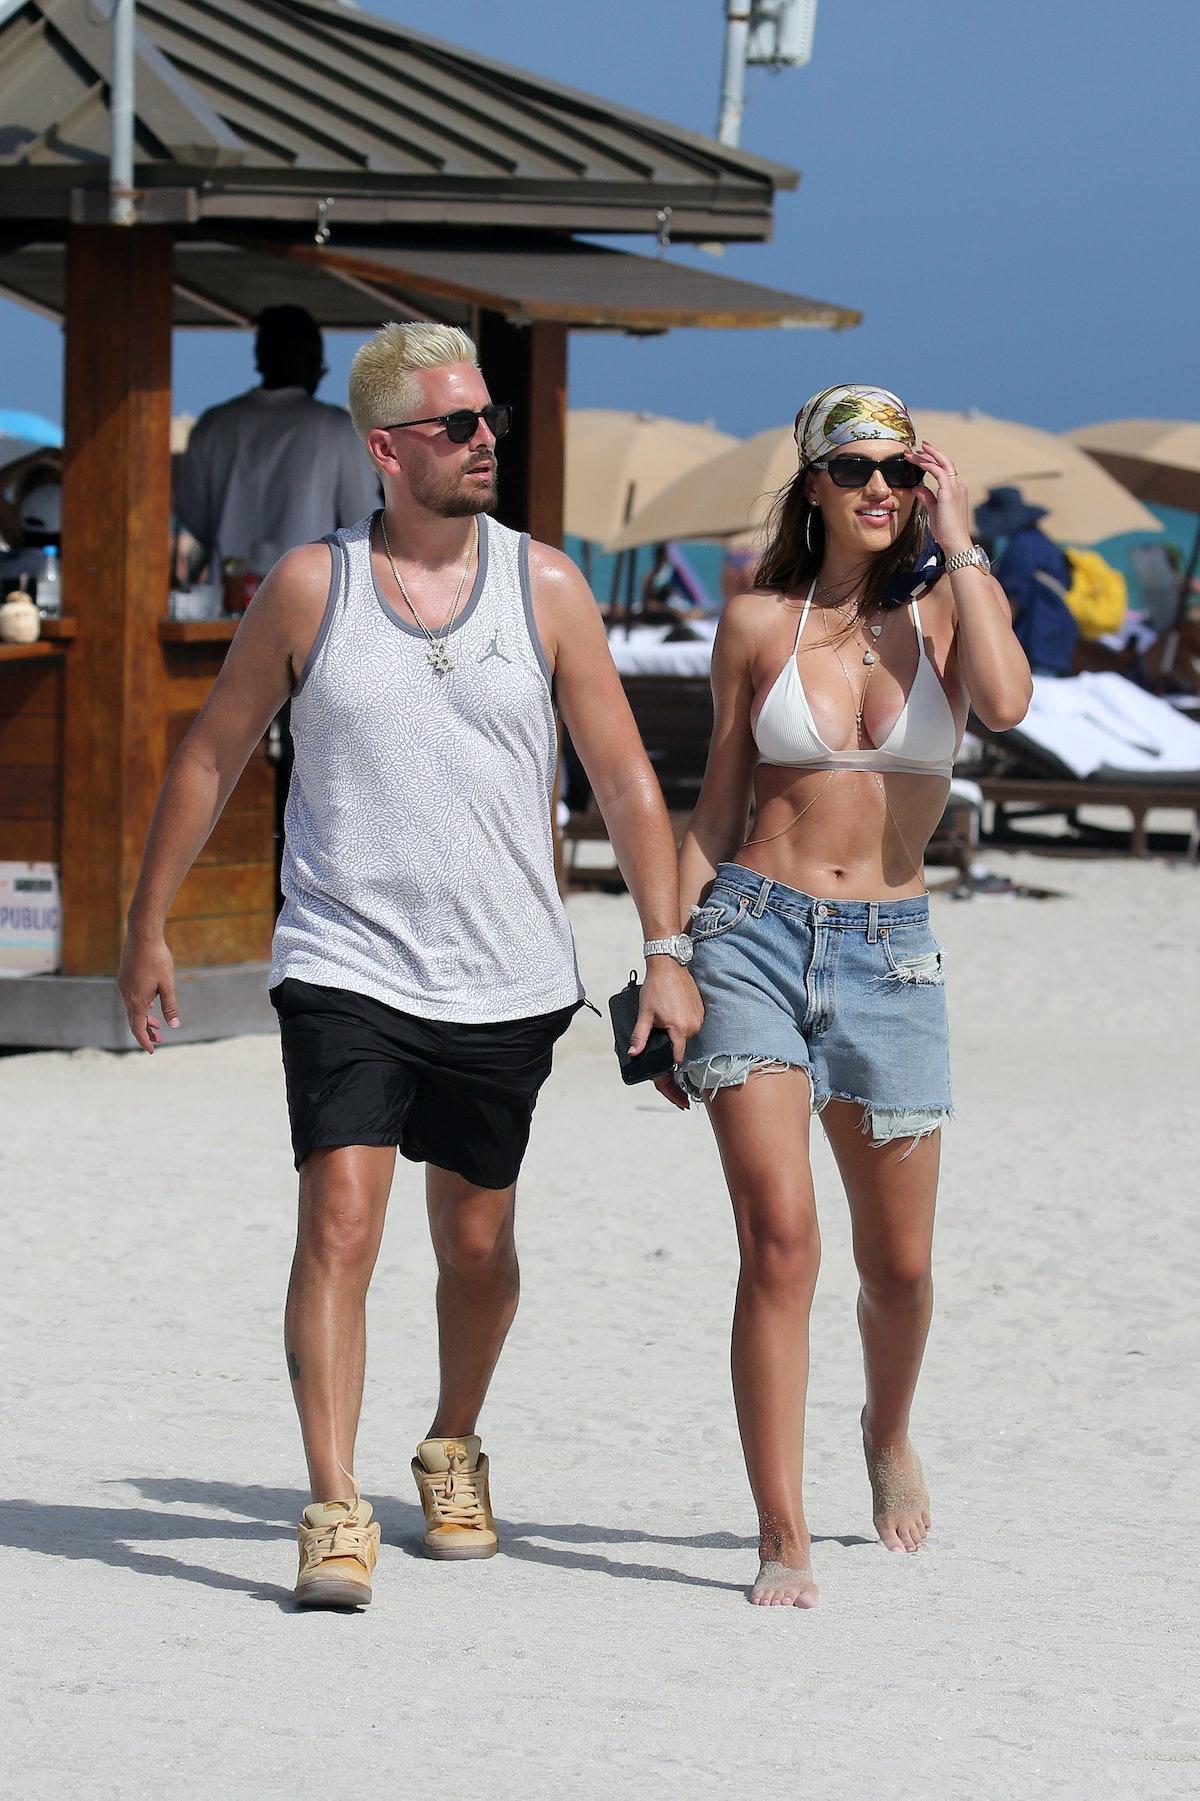 MIAMI, FL - FEBRUARY 14:  Scott Disick and Amelia Hamlin are seen on February 14, 2021 in Miami, Florida. (Photo by MEGA/GC Images)